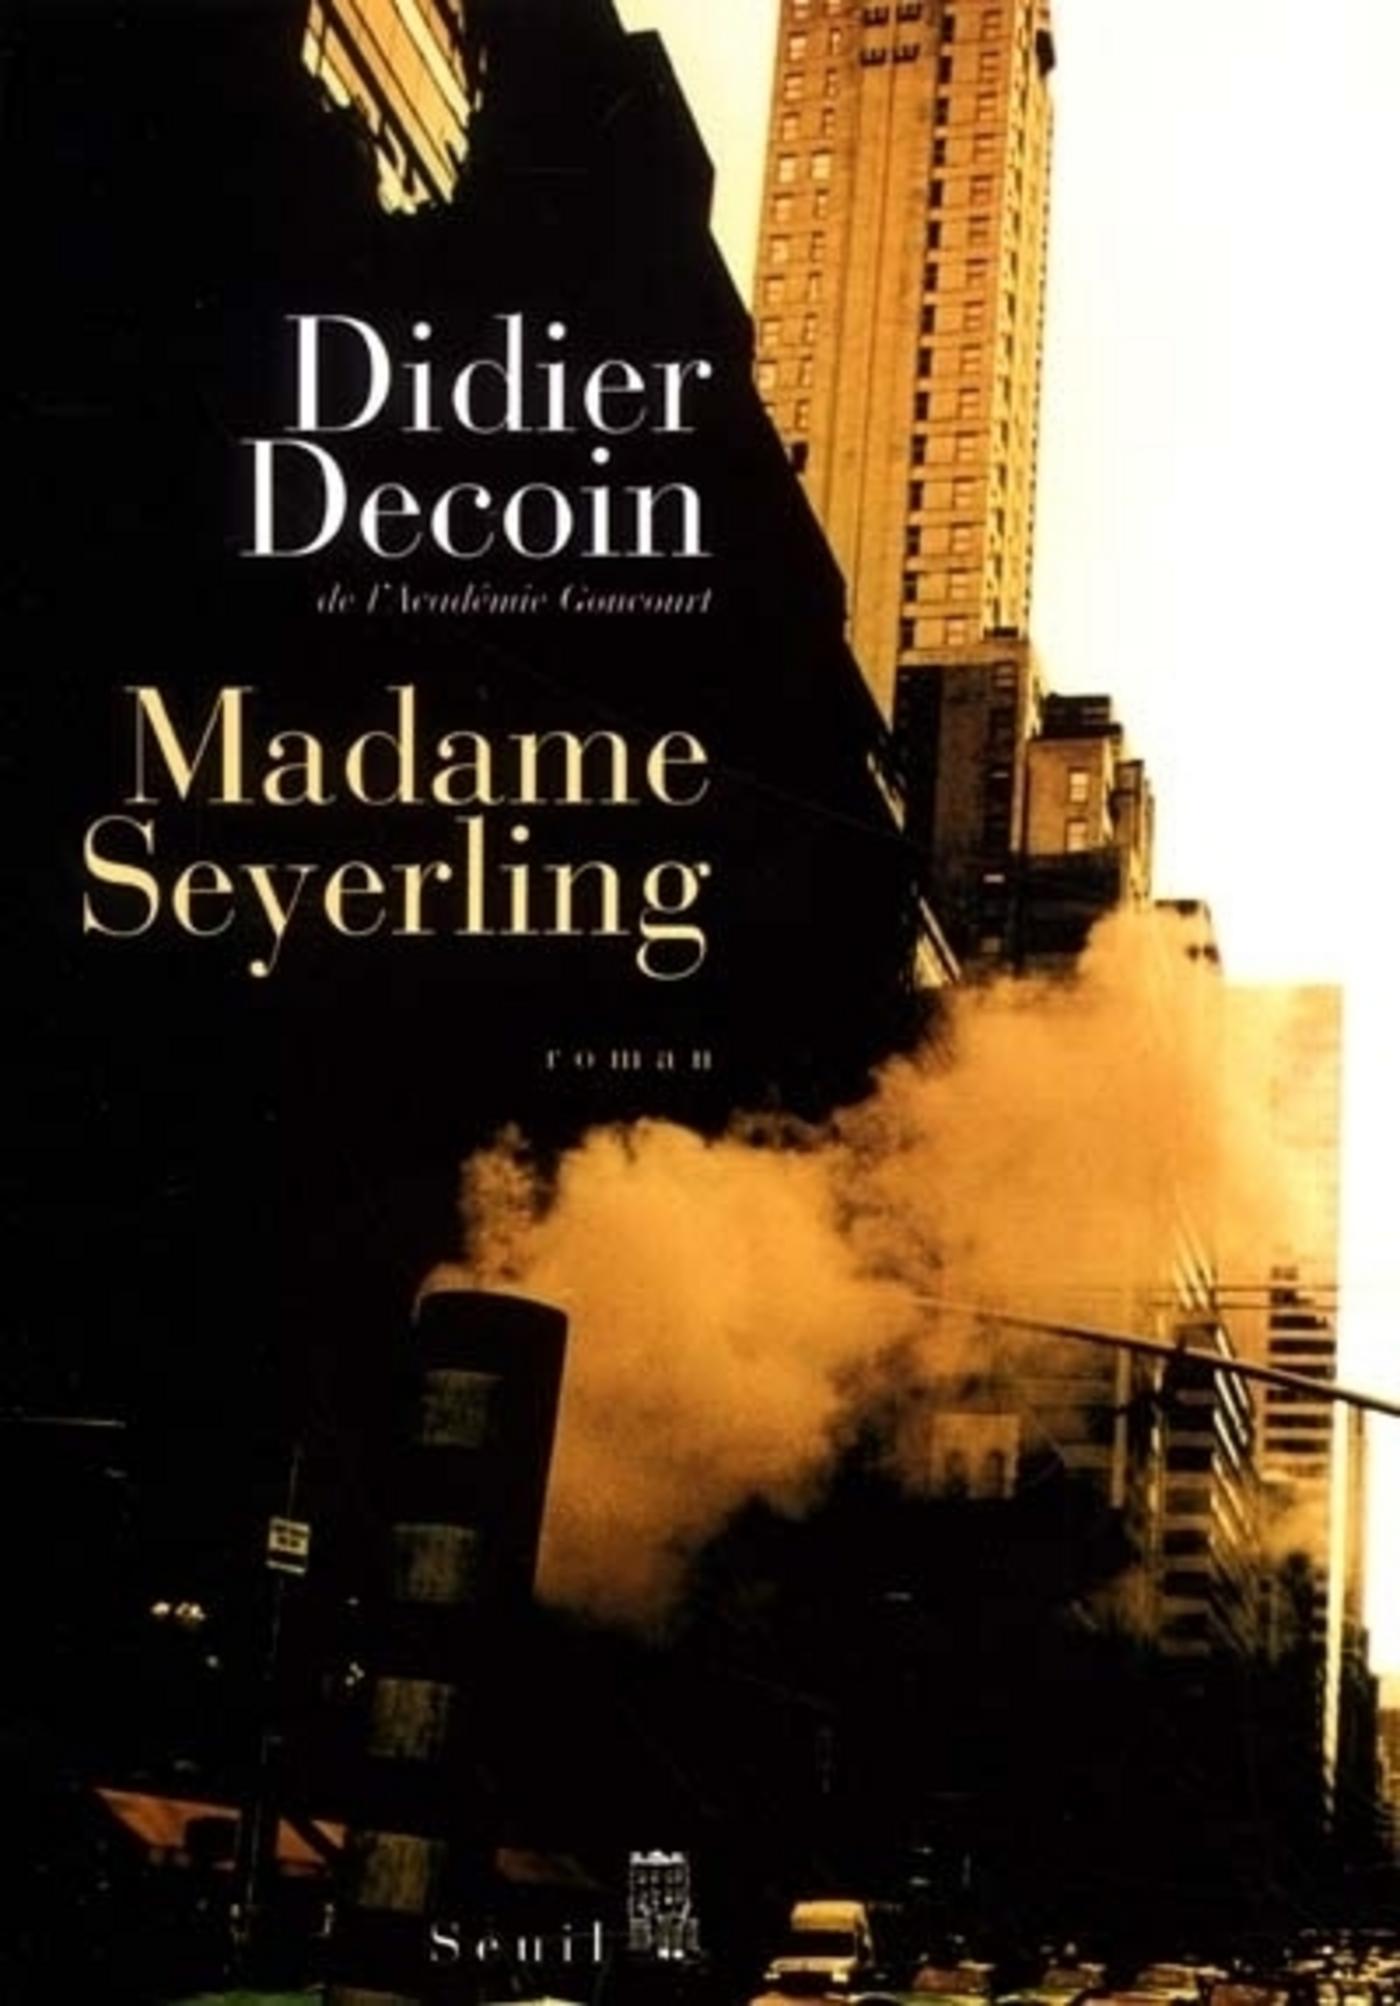 Madame Seyerling